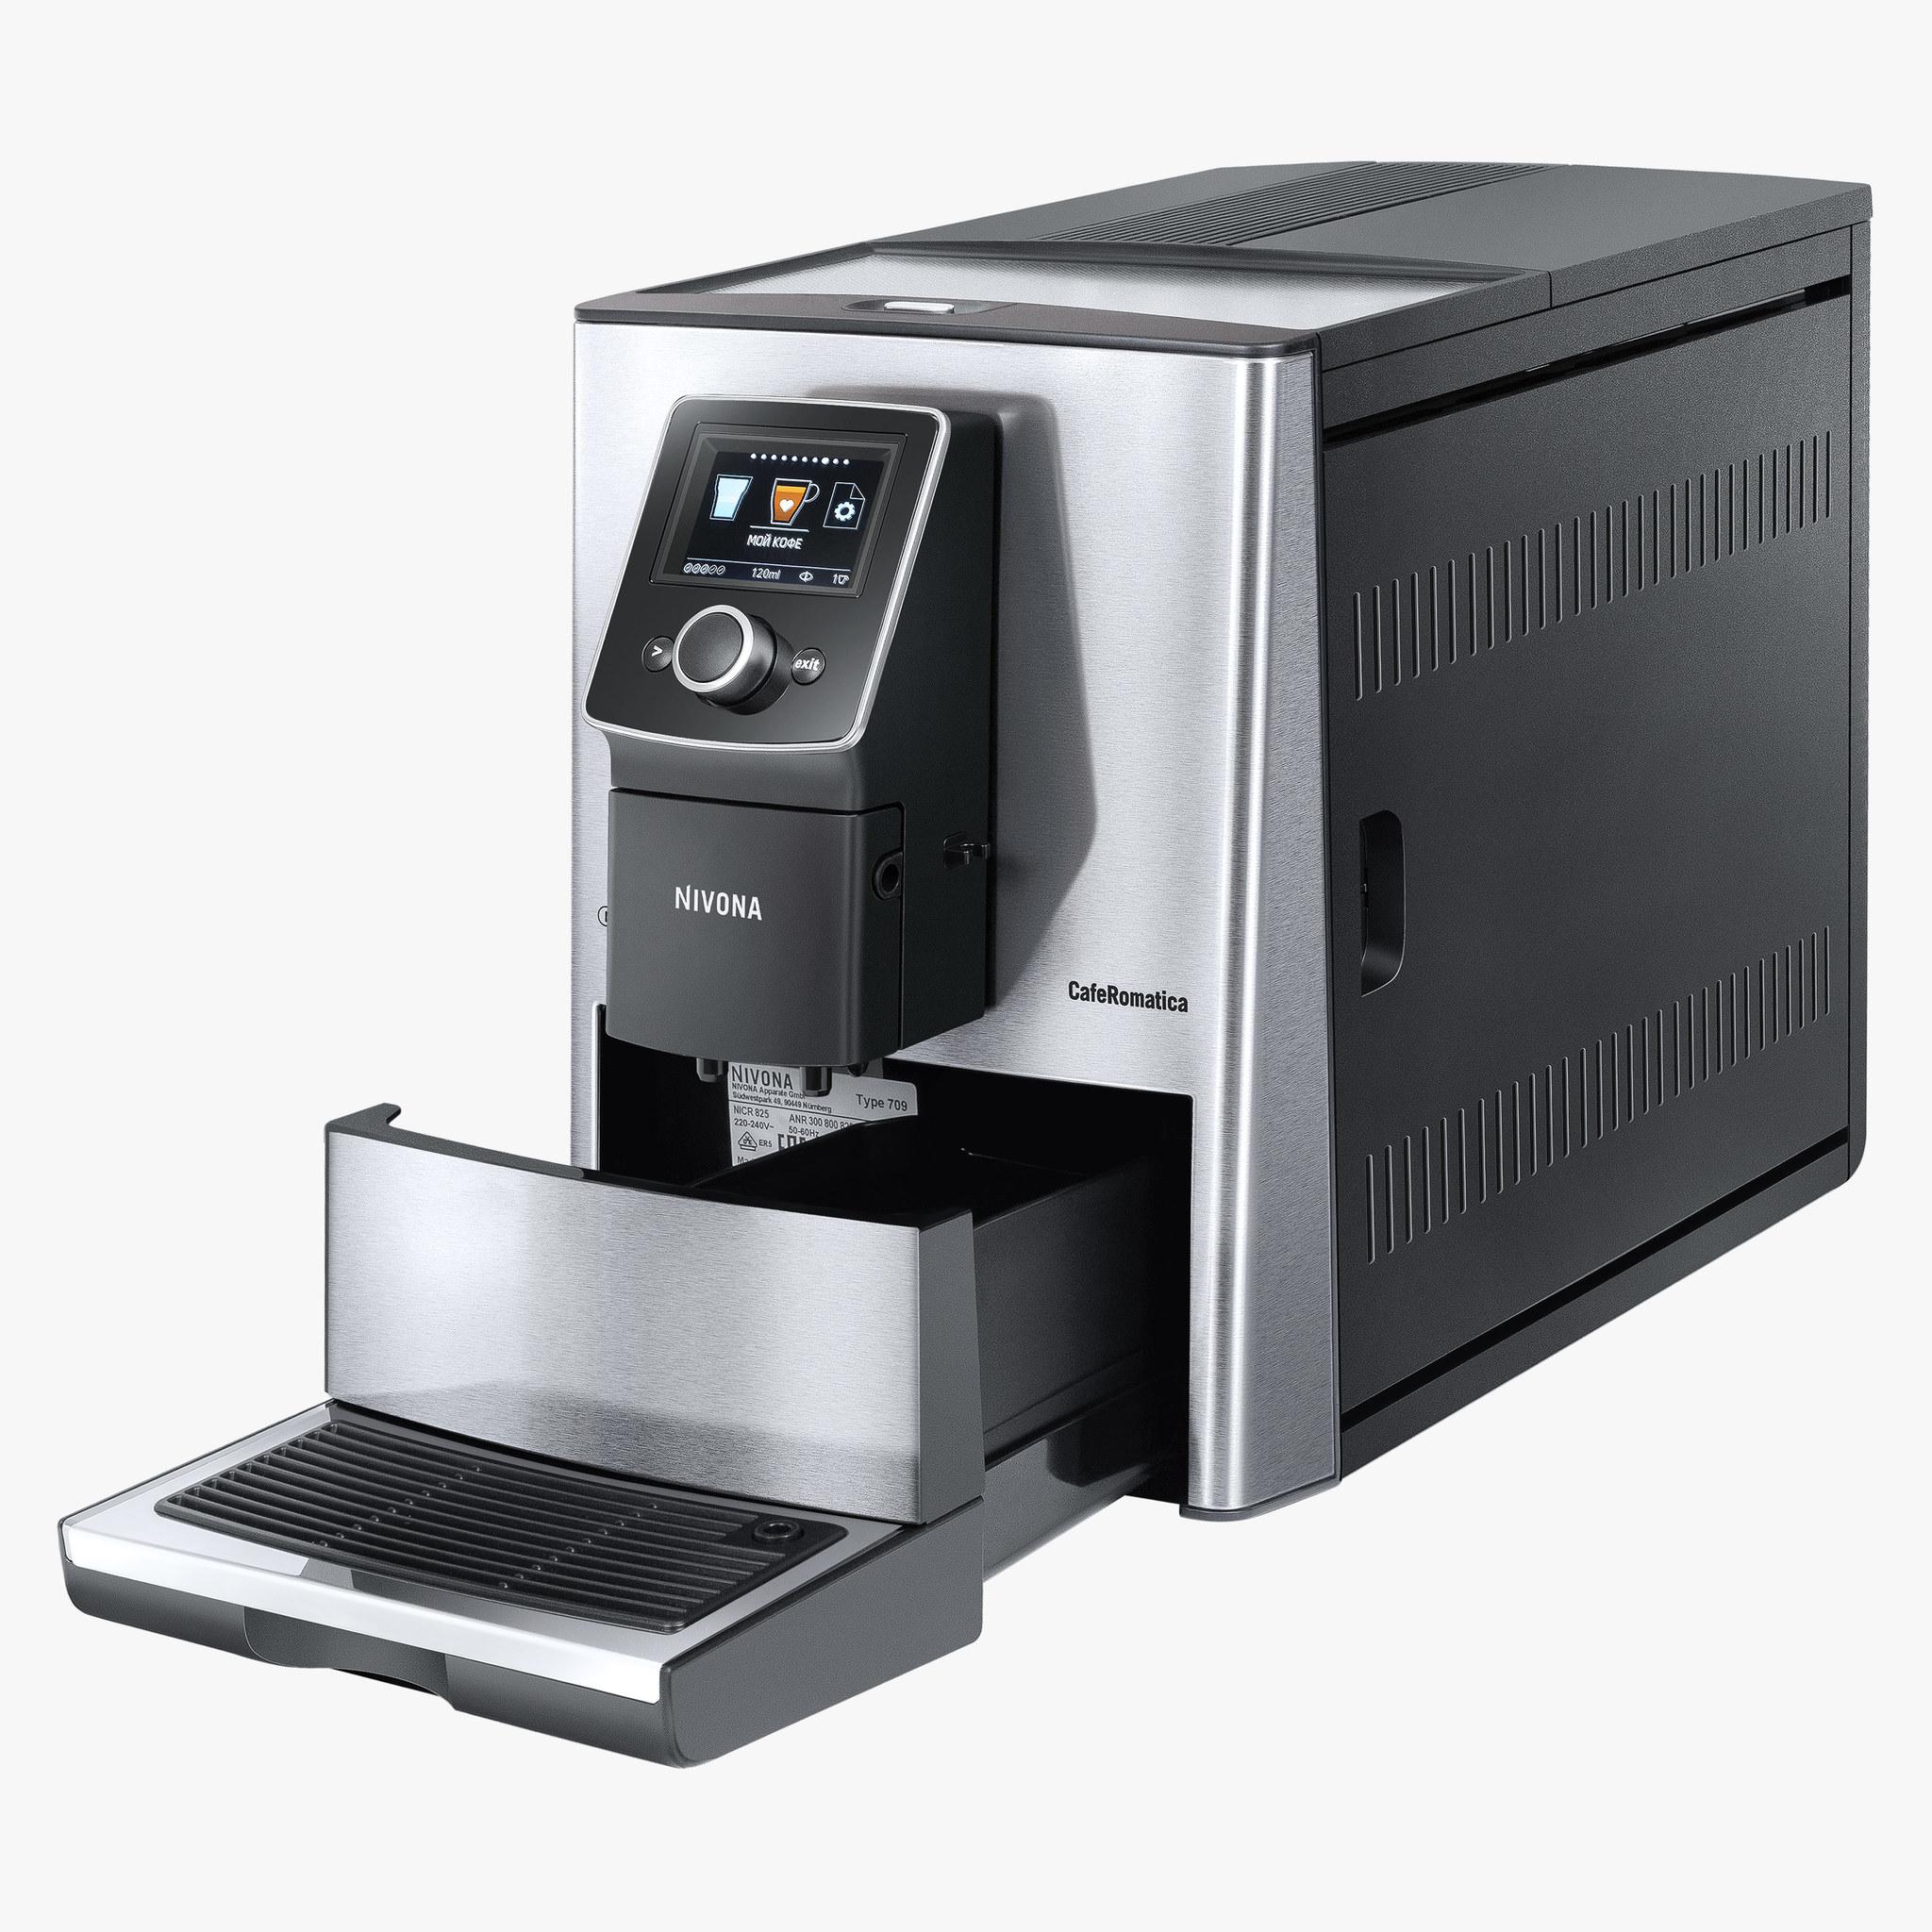 Кофемашина Nivona CafeRomatica NICR 825